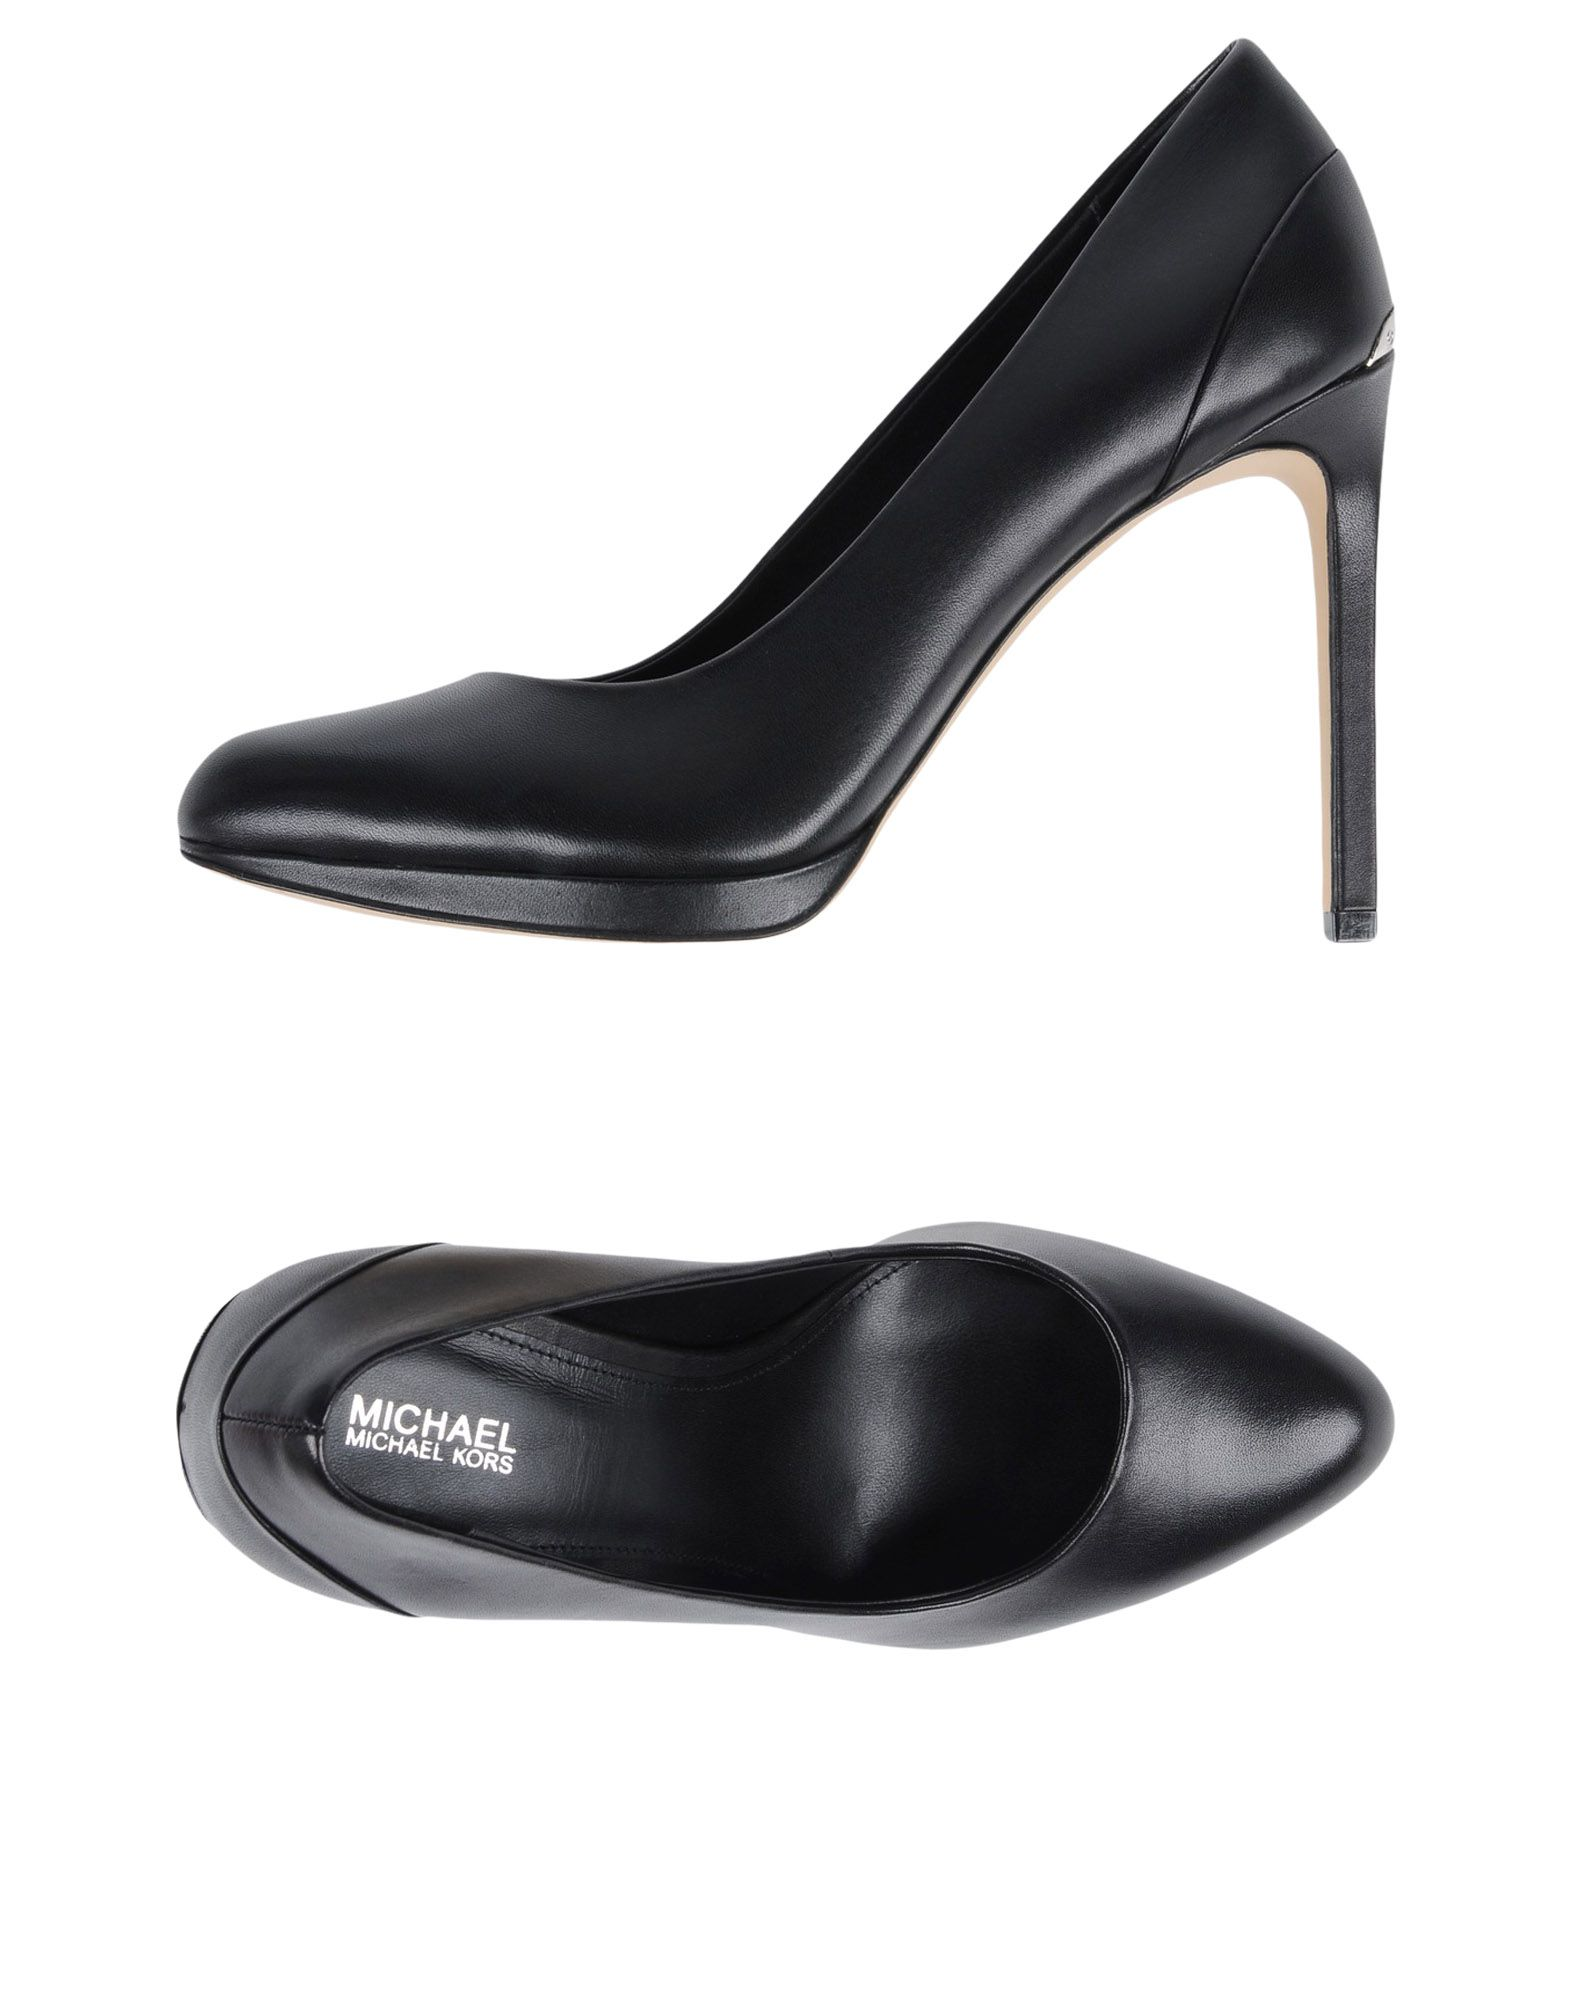 Sandali Nuove Grünland Donna - 11485525QP Nuove Sandali offerte e scarpe comode eb01f8